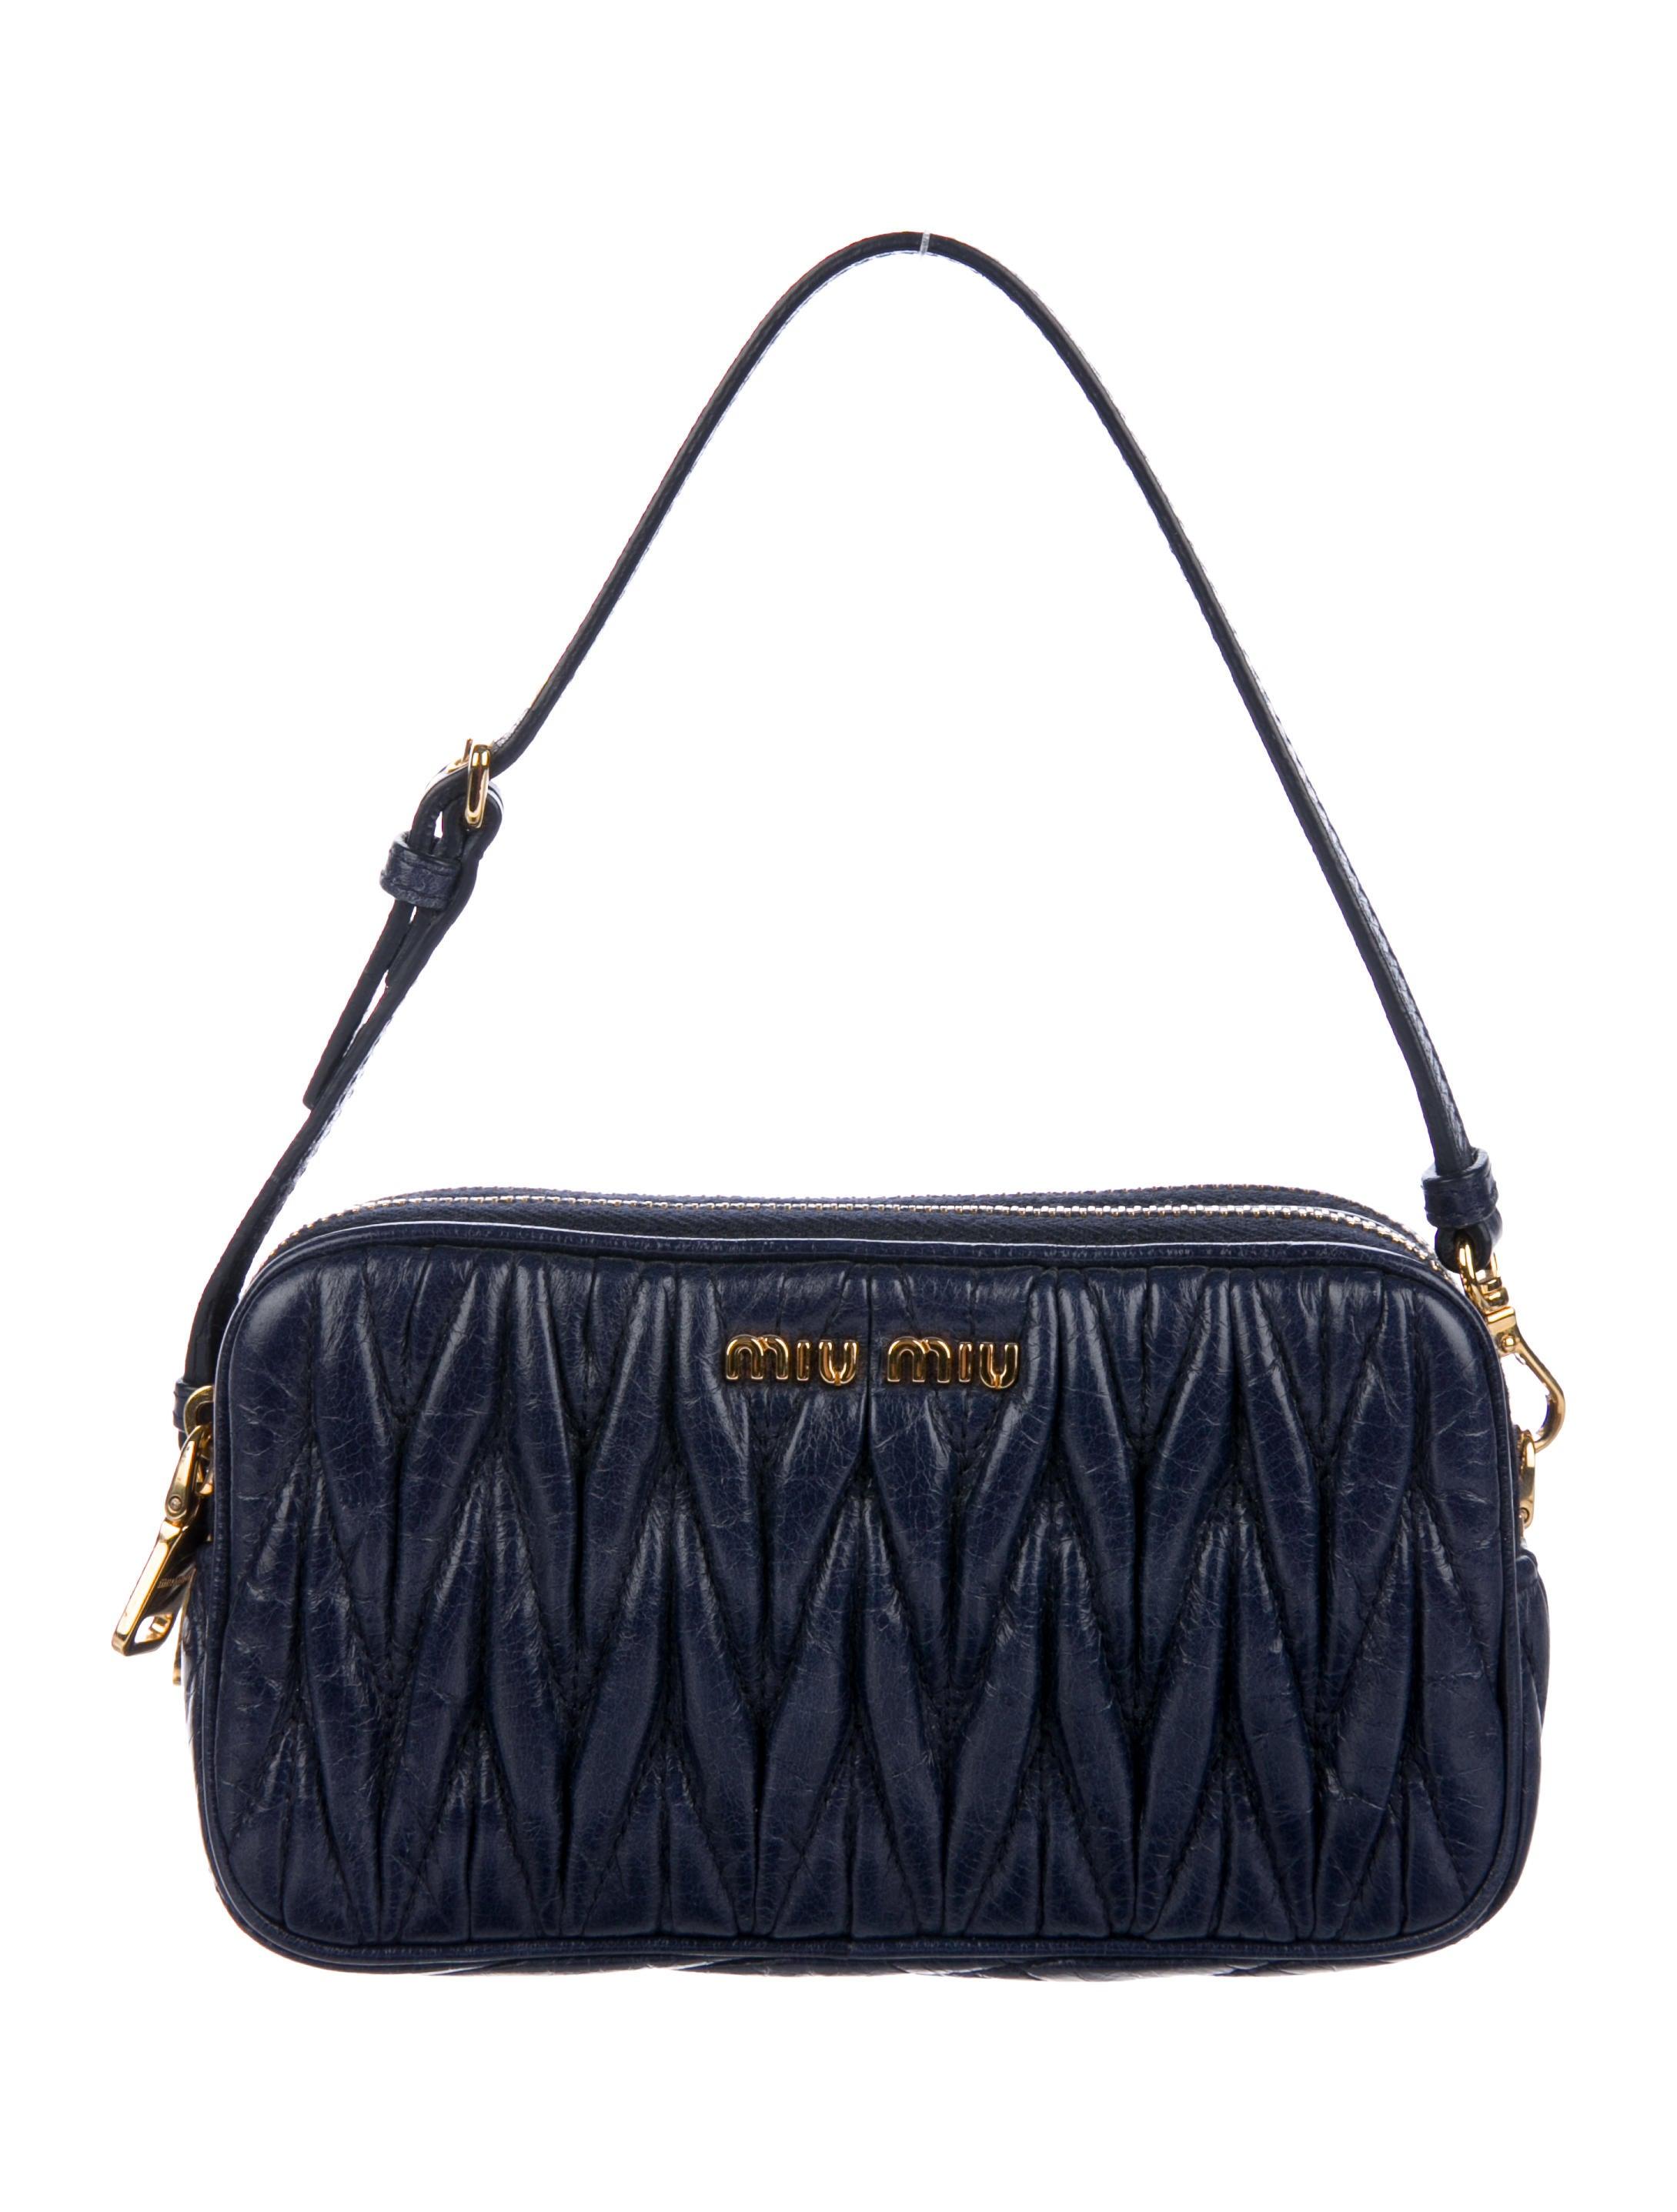 e8621197ff9 Miu Miu Matelassé Lux Clutch w  Tags - Handbags - MIU69271